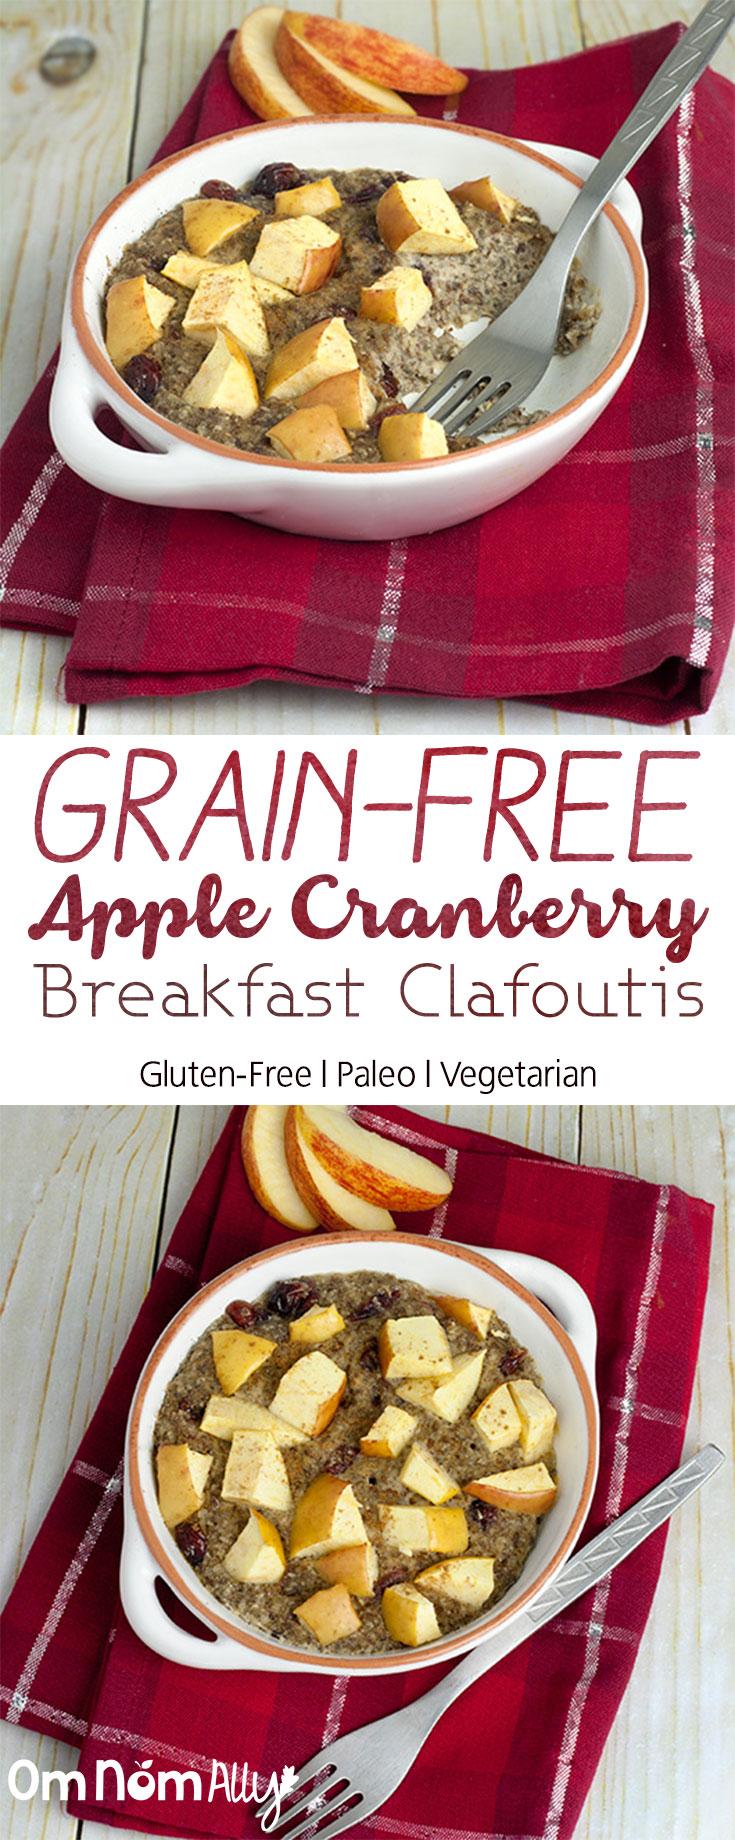 Grain-Free Apple Cranberry Breakfast Clafoutis @OmNomAlly